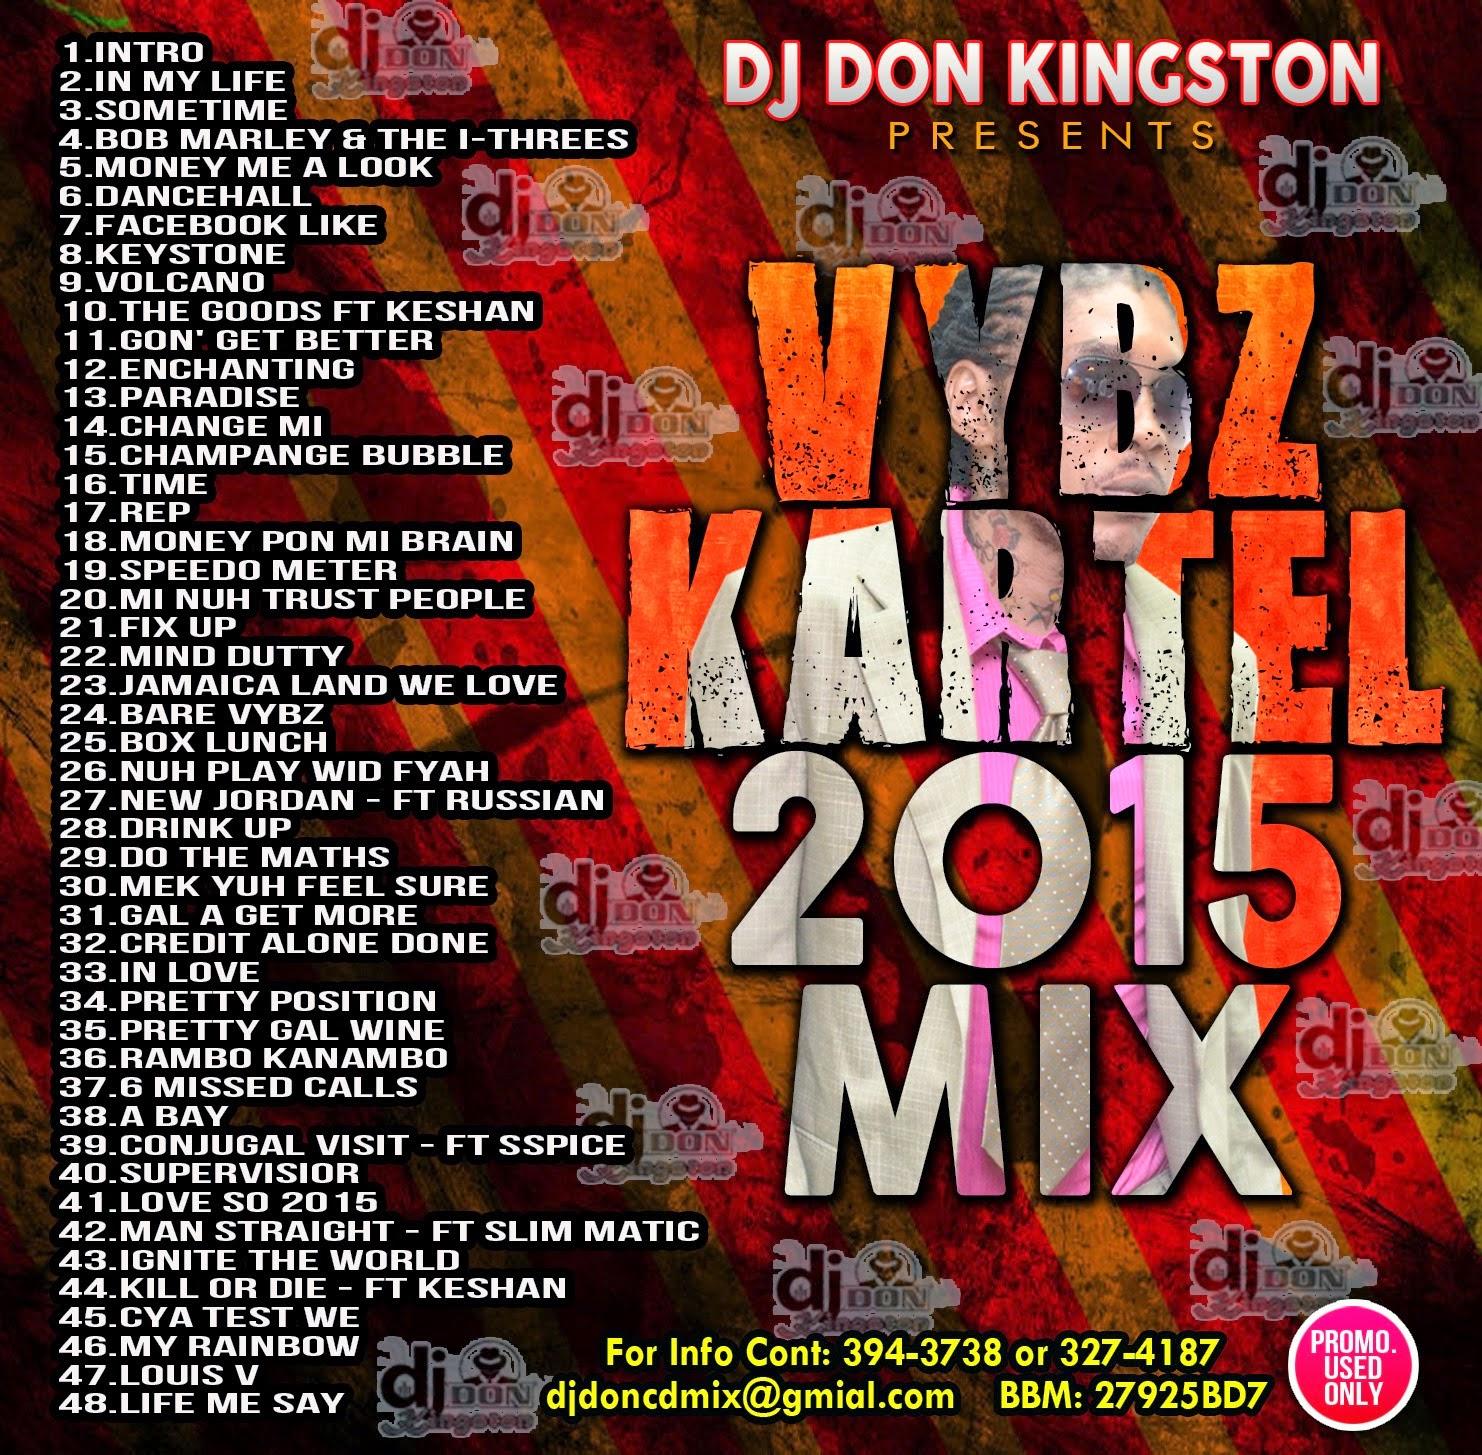 REGGAETAPES: DJ DON - VYBZ KARTEL 2015 MIX